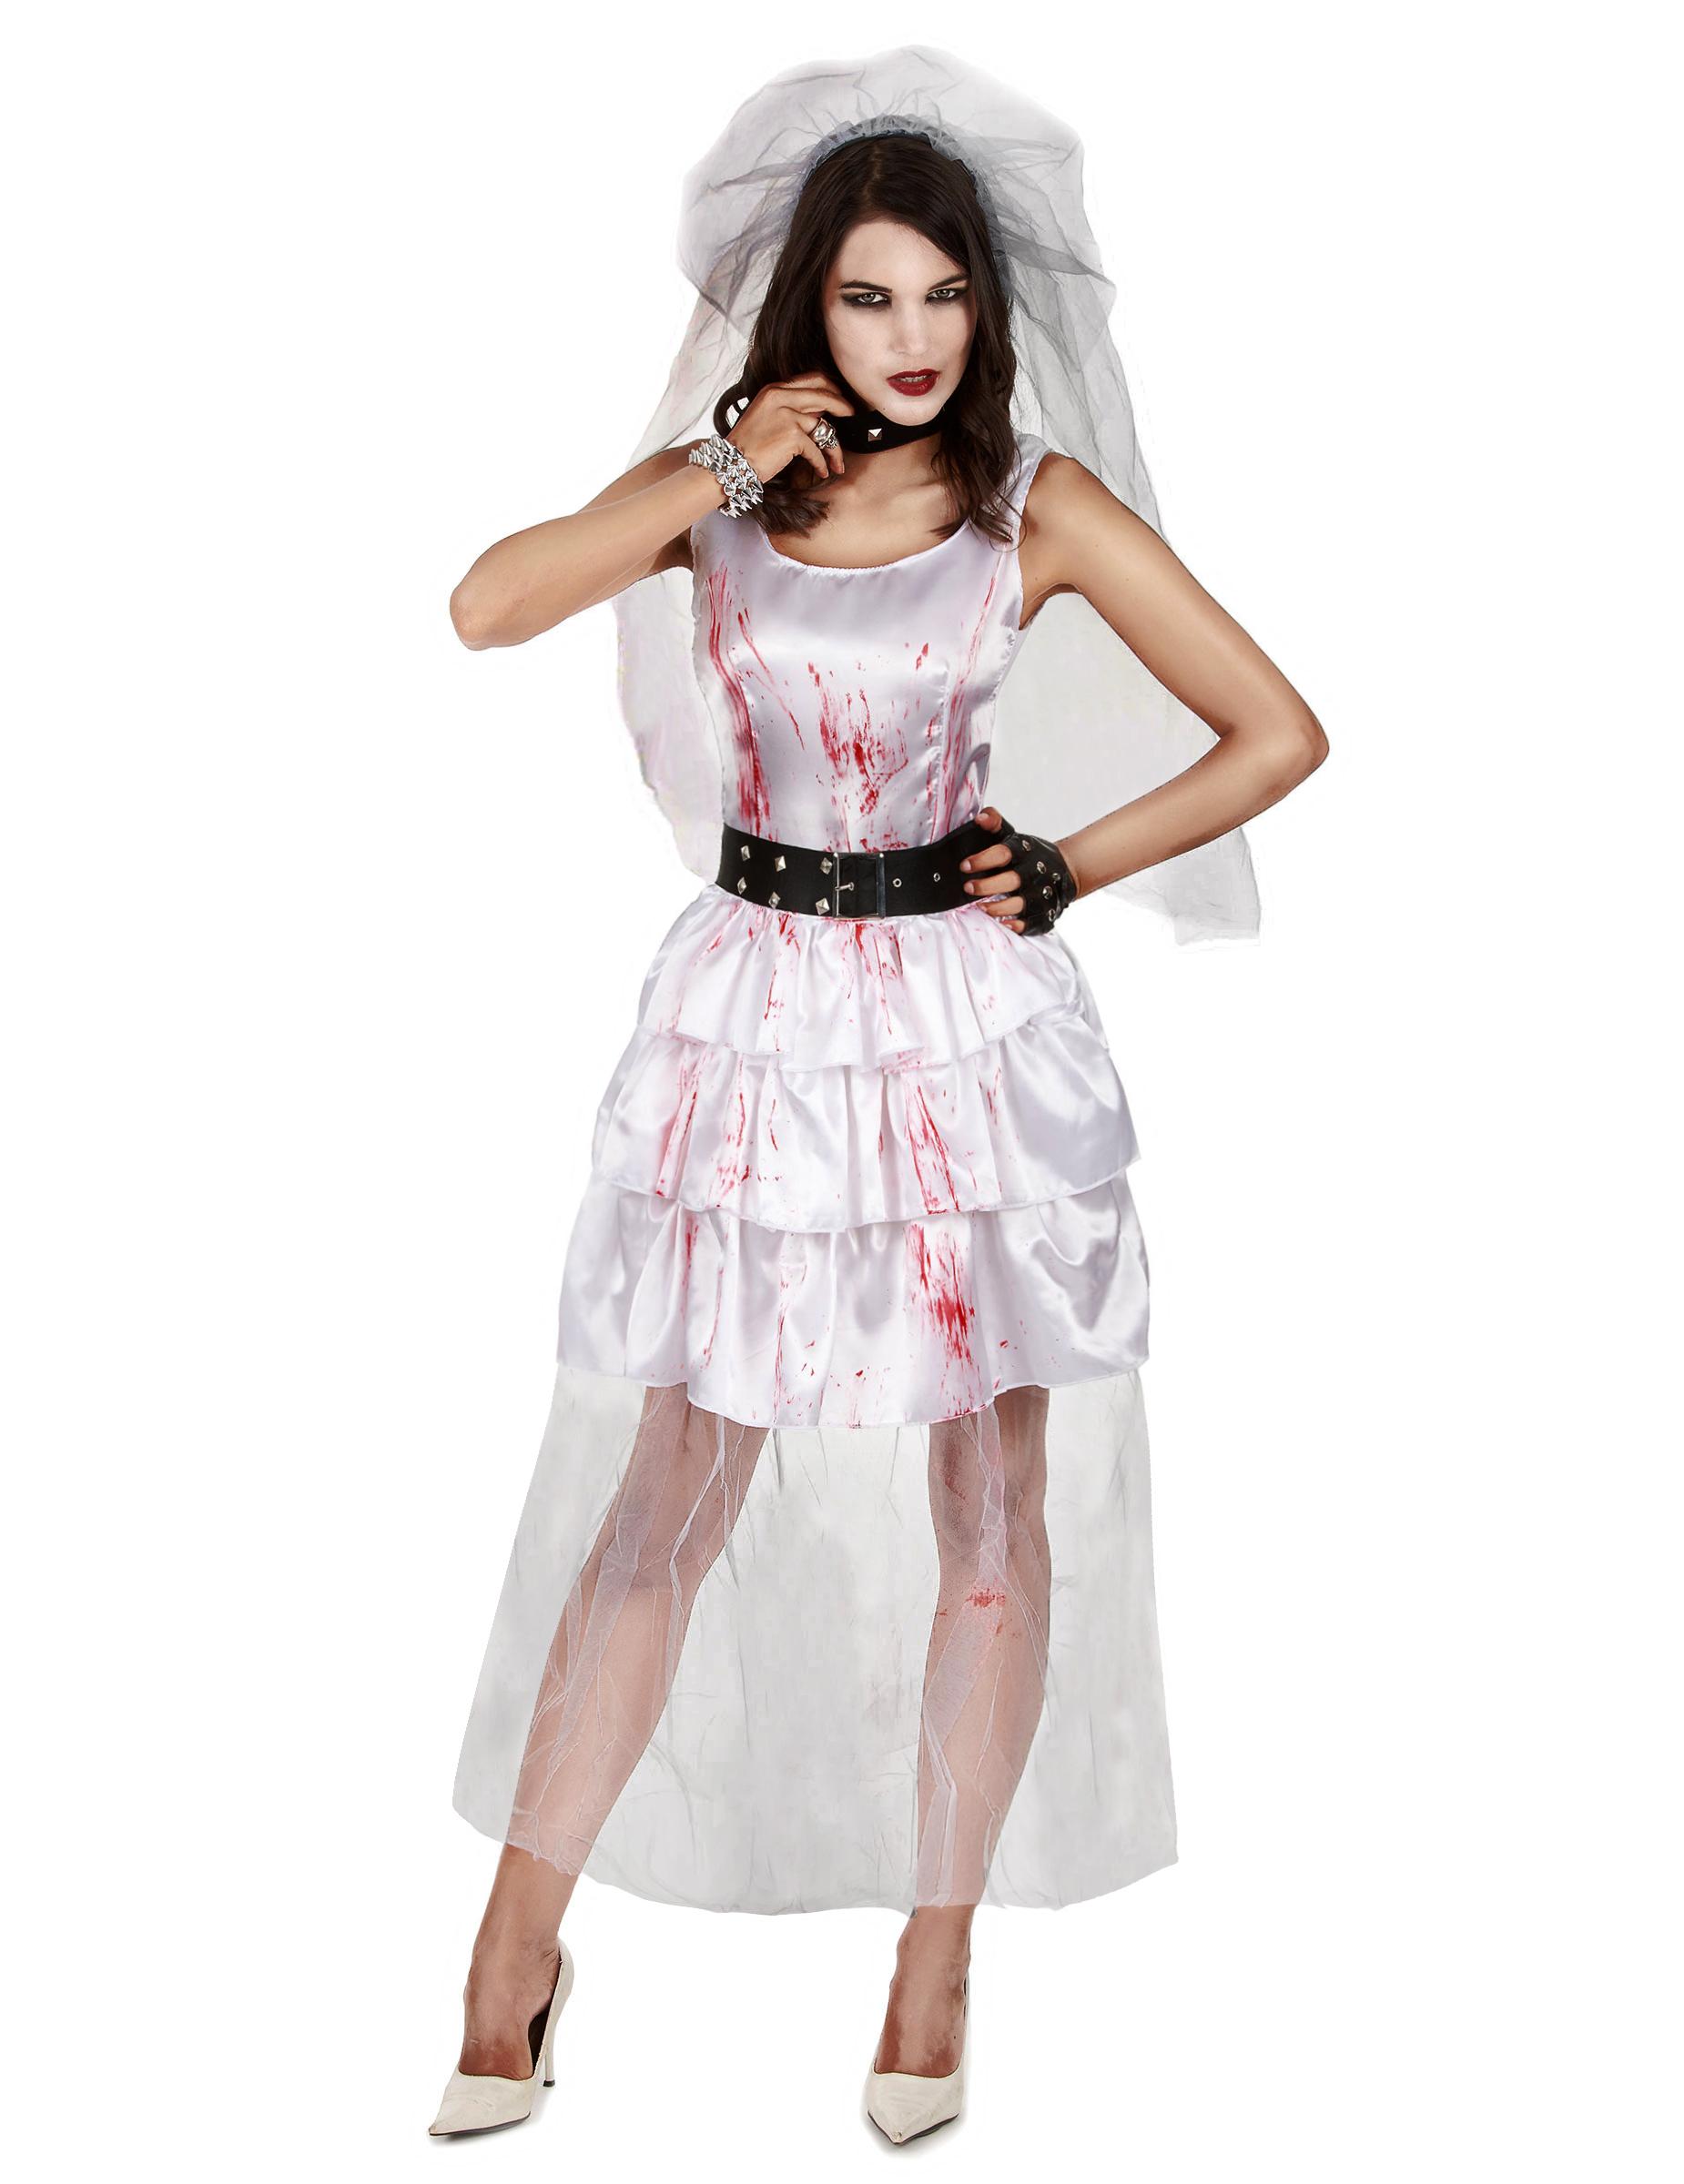 d guisement mari e zombie femme halloween d coration. Black Bedroom Furniture Sets. Home Design Ideas